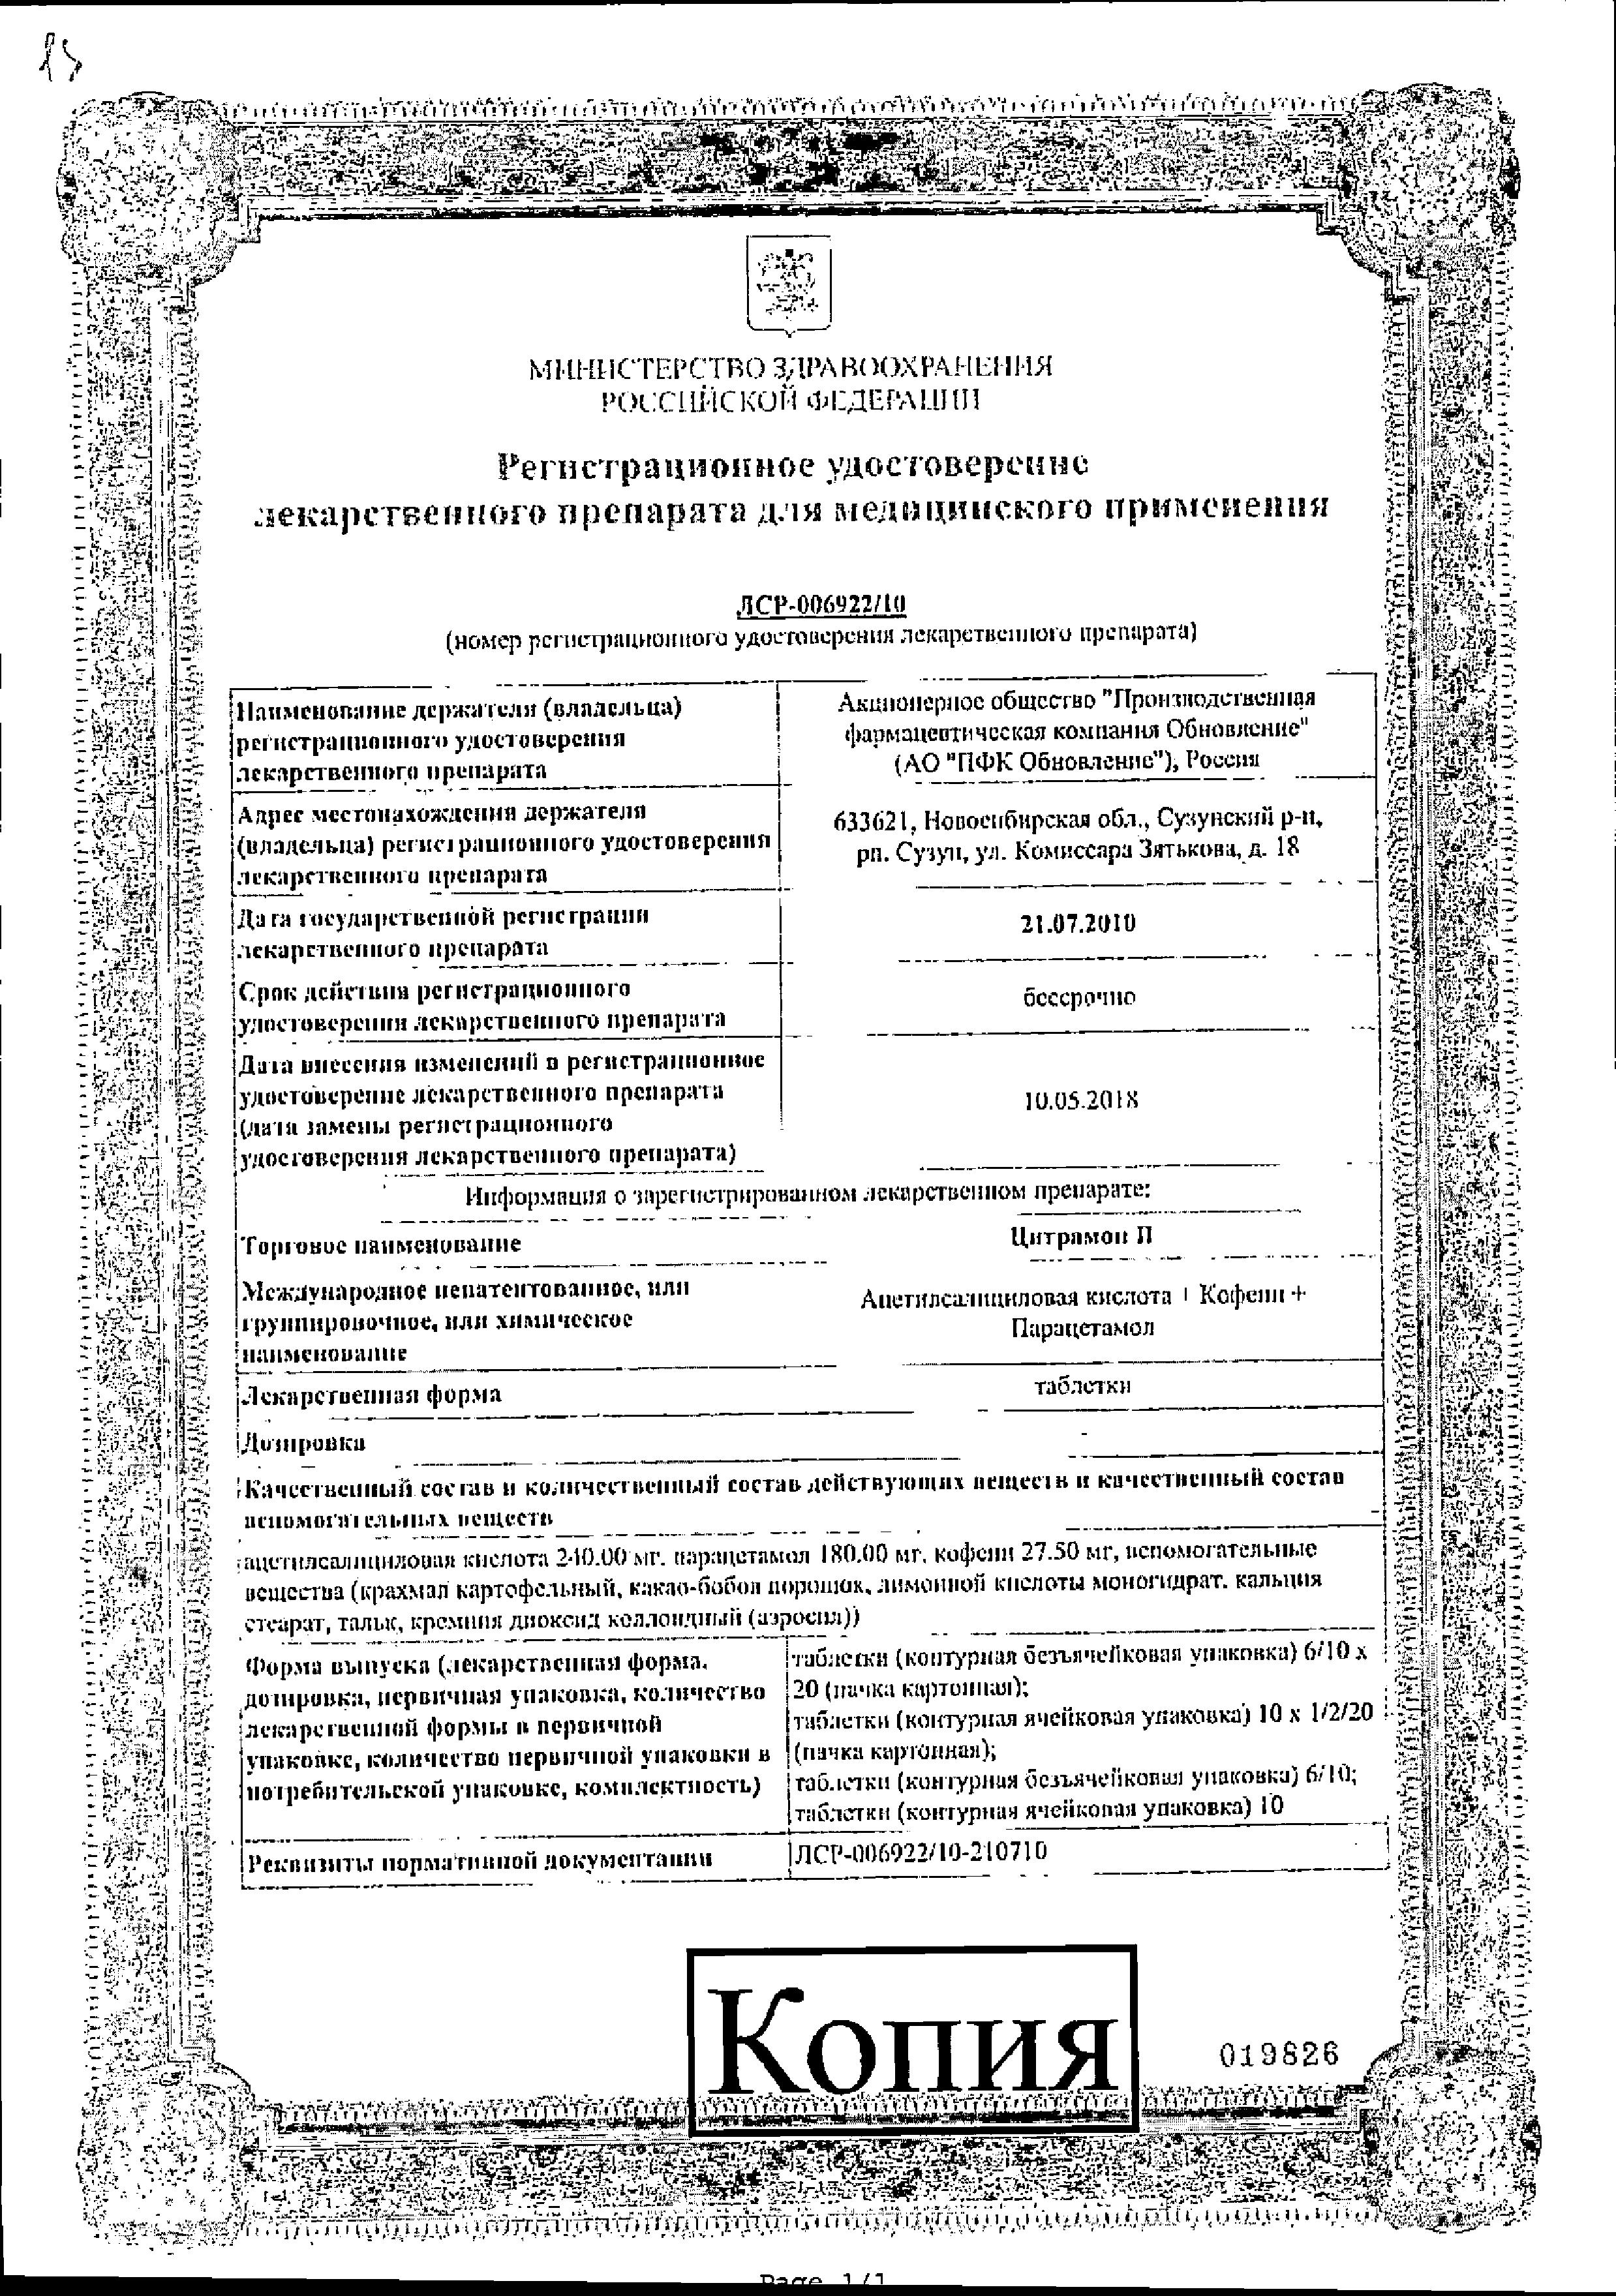 Цитрамон П сертификат